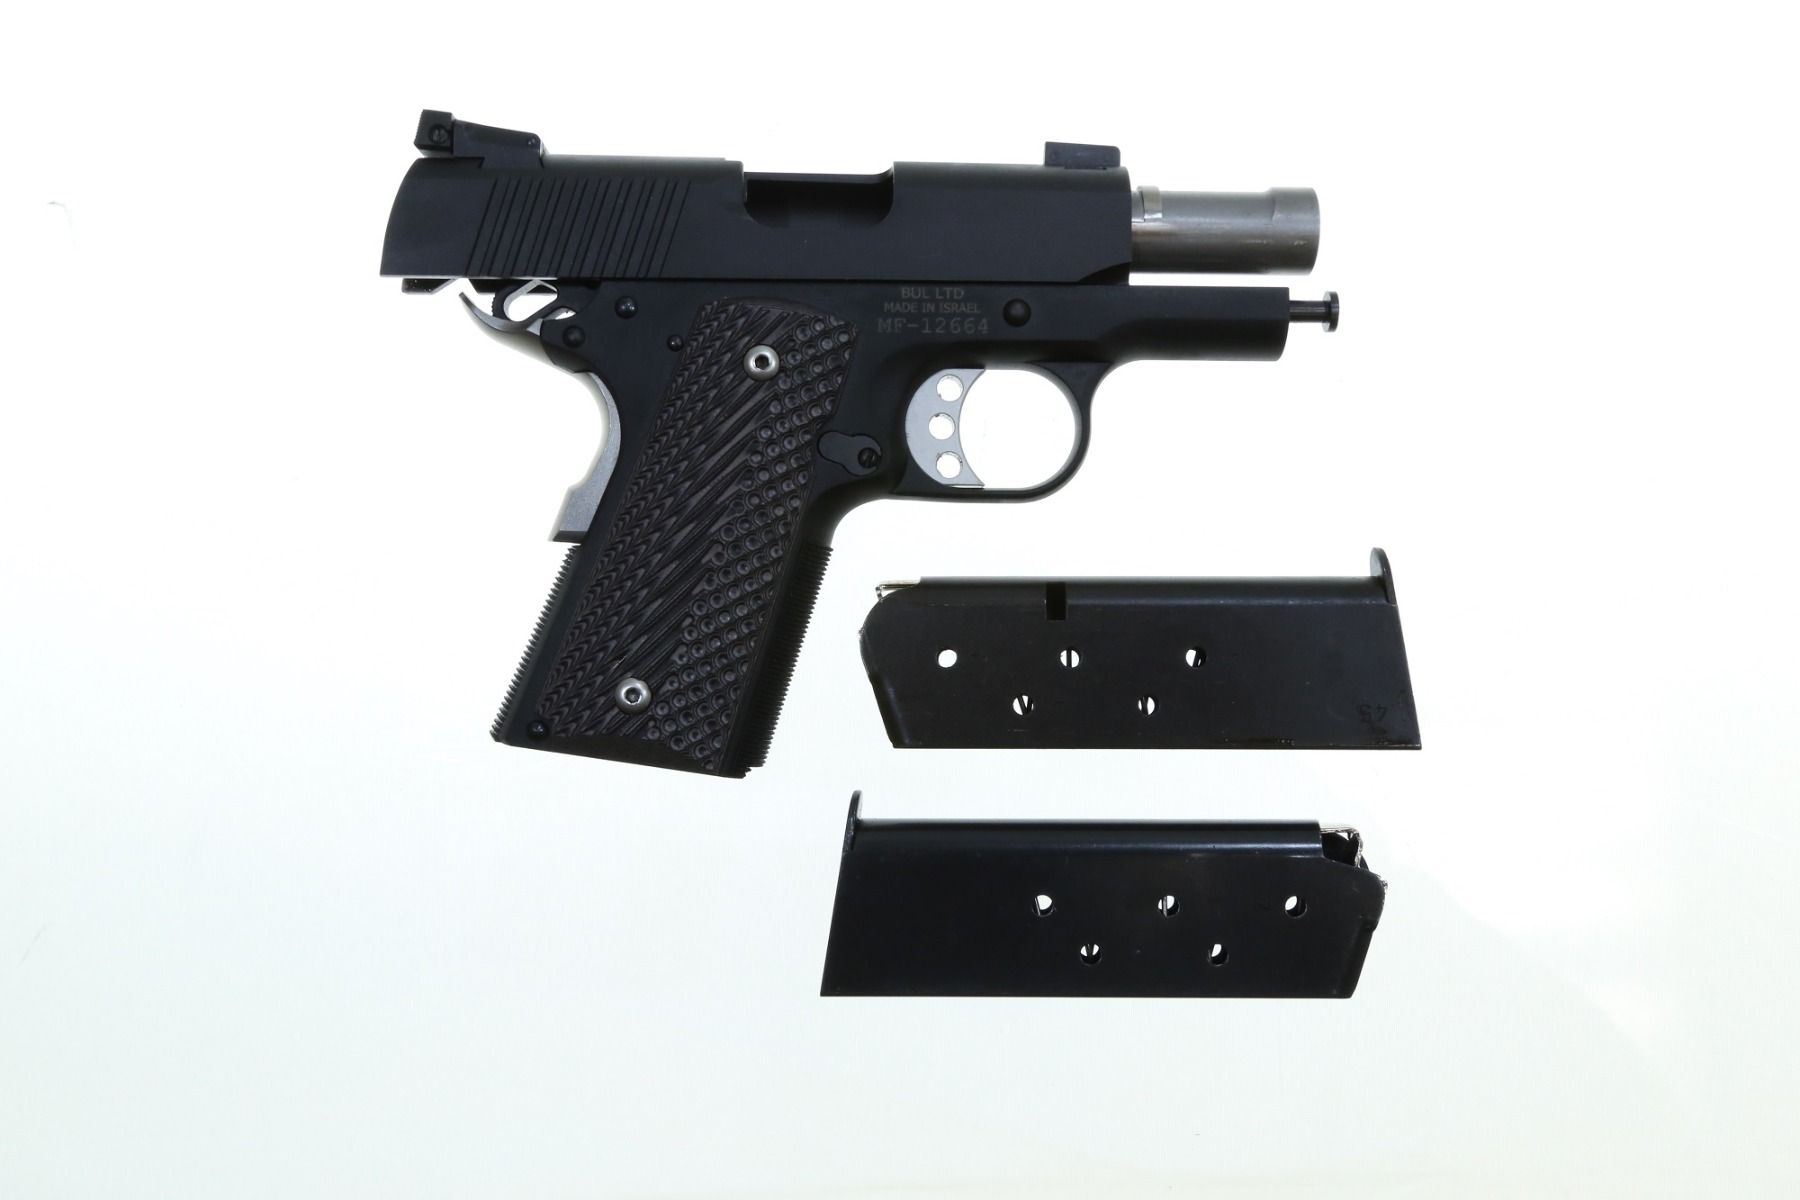 BUL Classic Ultra Compact .45ACP 1911 Pistol Blued Aluminum Frame